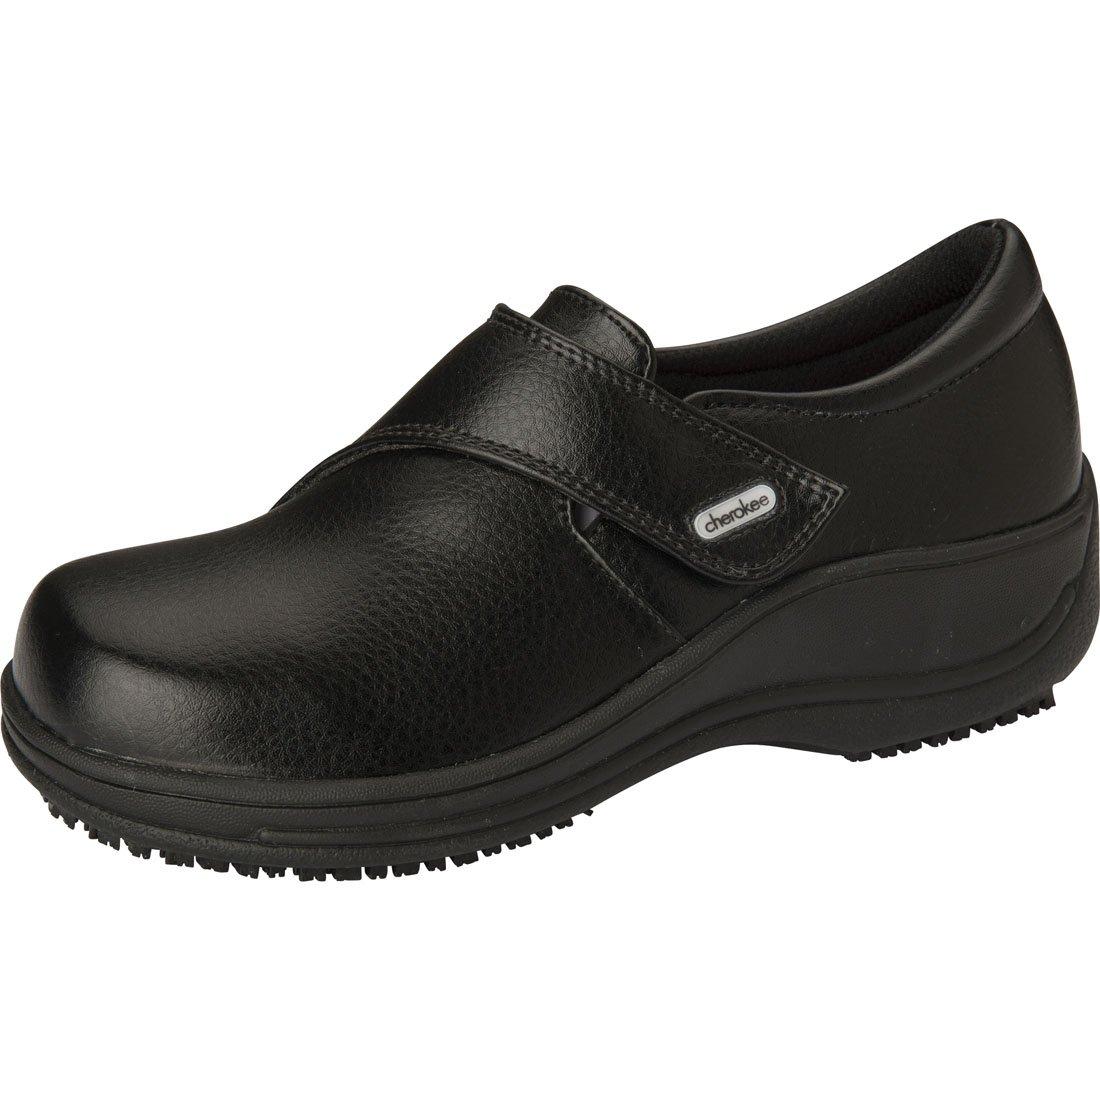 Footwear By Cherokee Women's Monk Strap Clog Black by Cherokee